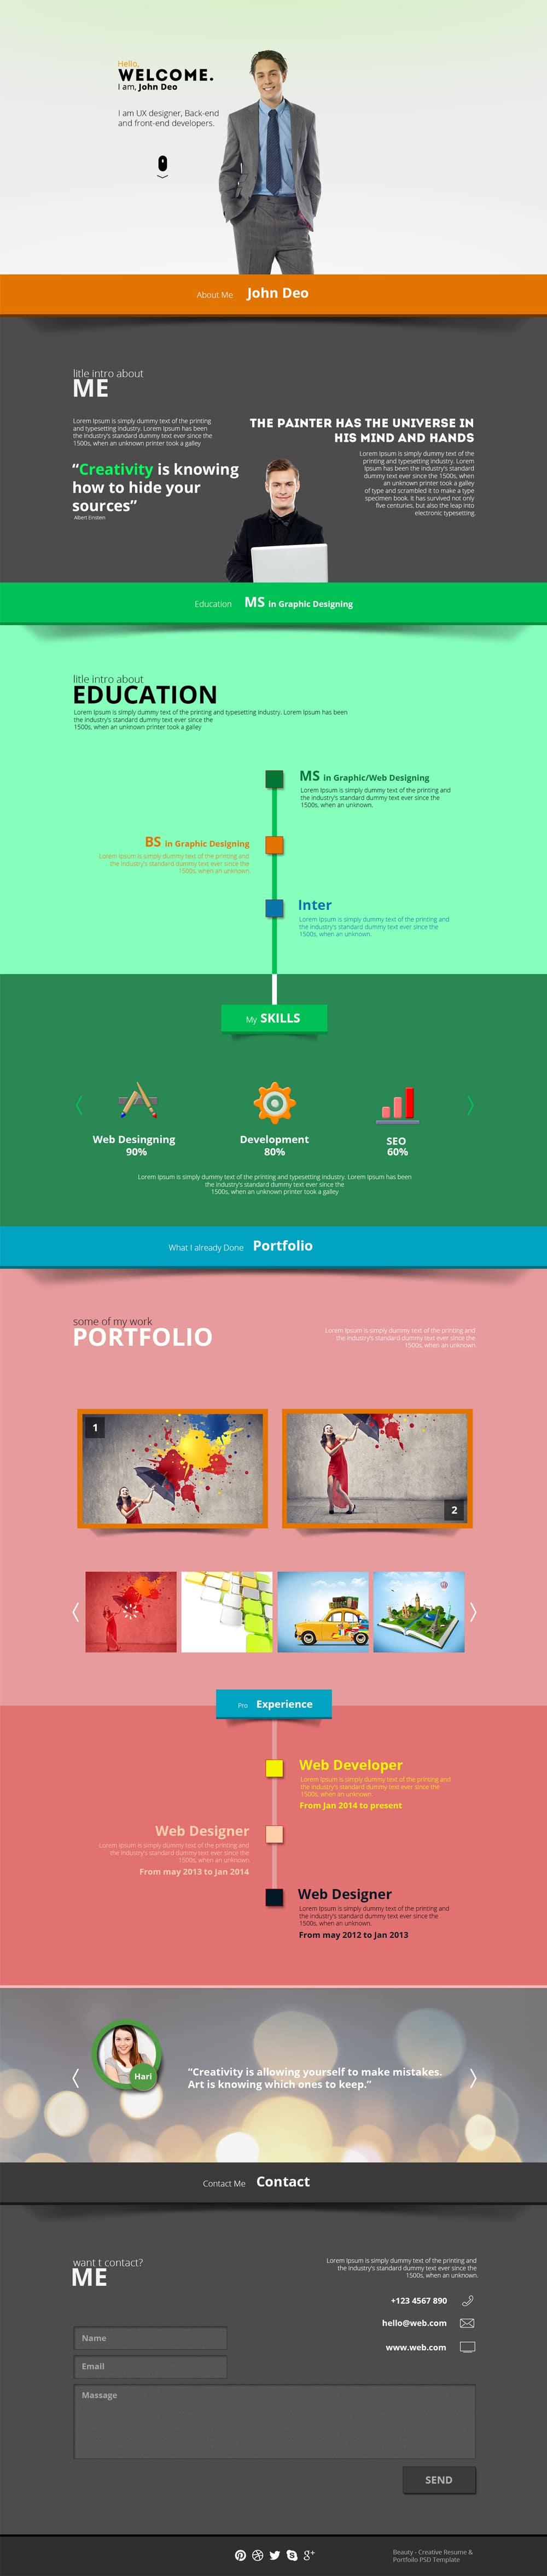 Beauty – Creative Resume & Portfolio PSD Template